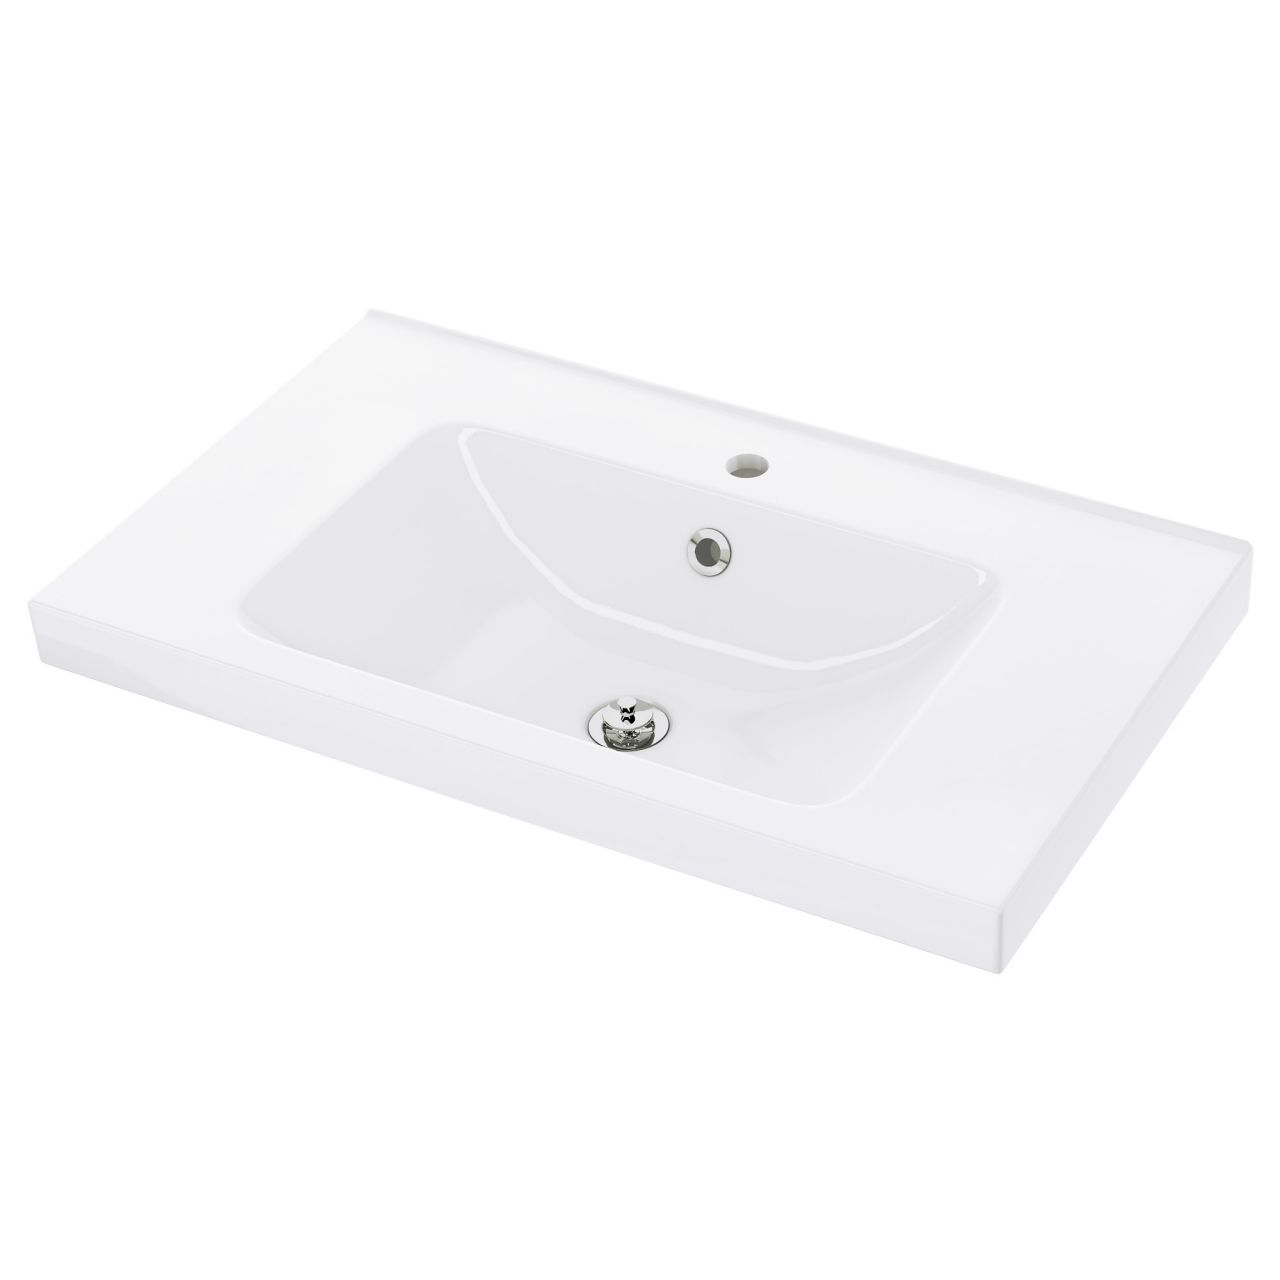 Vasque de notre salle d'eau <br /> Vasque ikea ODENSVIK en 80cm